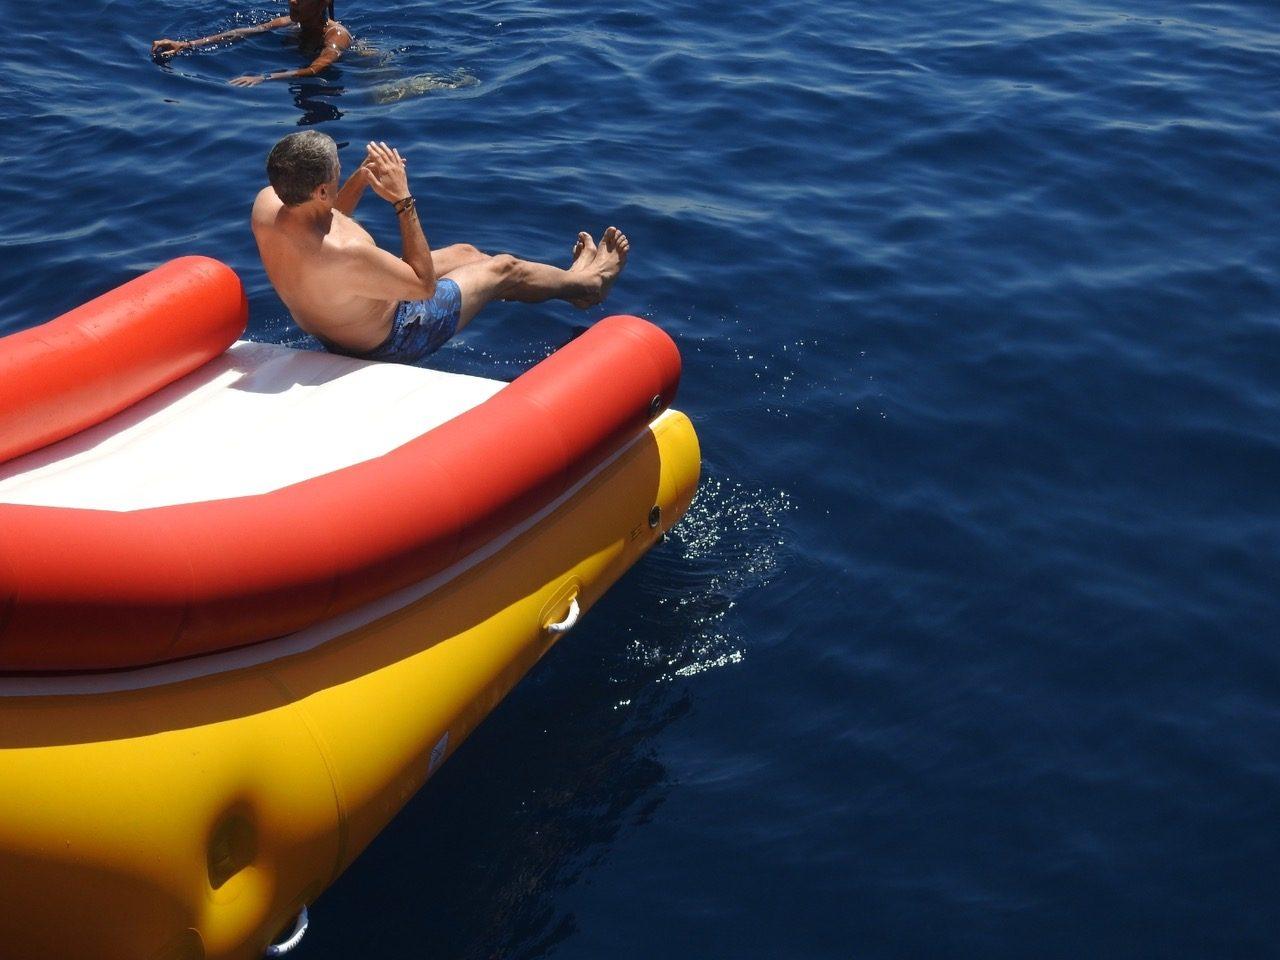 Custom Yacht Slide on Sailing Yacht Take It Easier